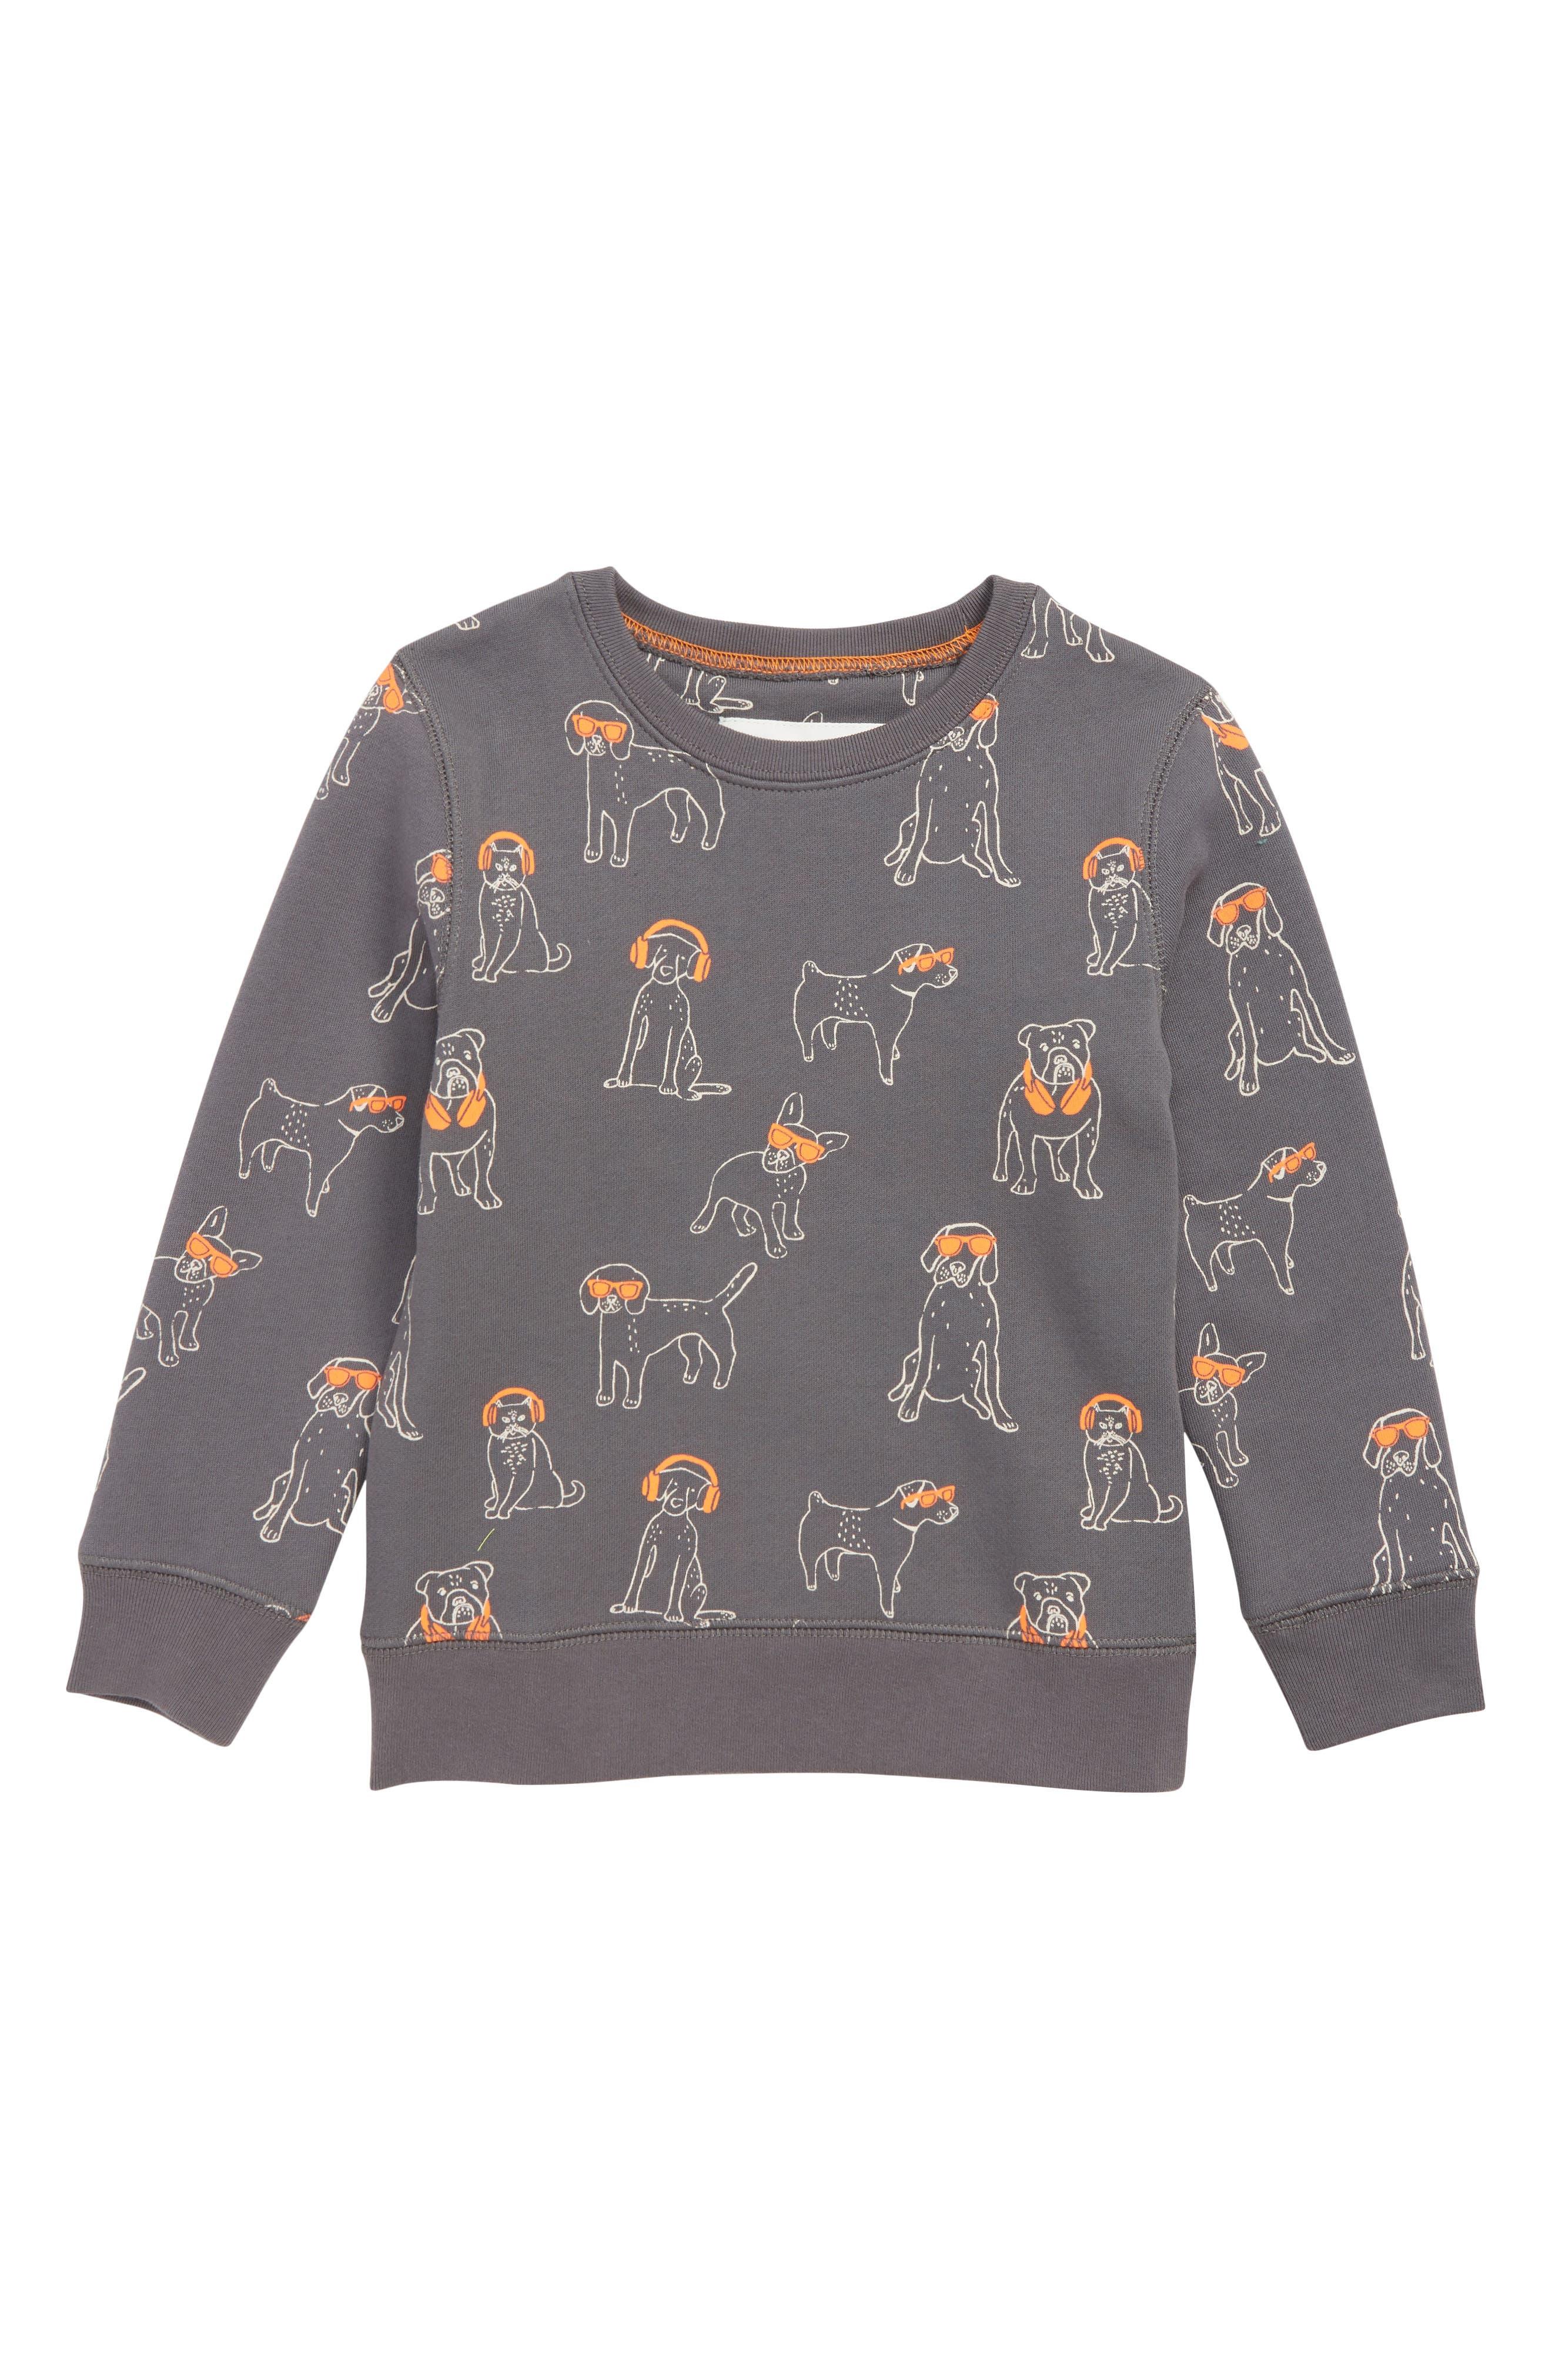 DJ Dogs Fun Sweatshirt,                             Main thumbnail 1, color,                             PEWTER GREY